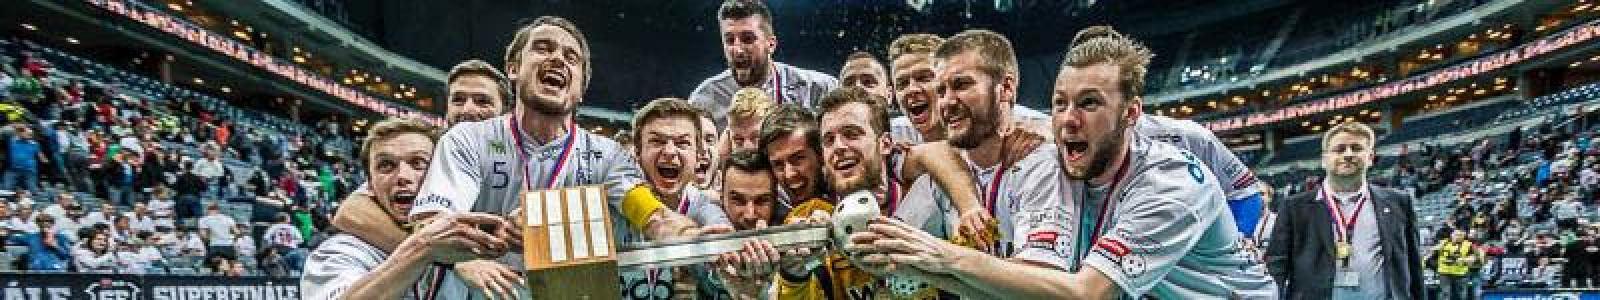 69a34e82e45c4 Banner 1. SC TEMPISH Vítkovice vs FAT PIPE FLORBAL CHODOV - Tipsport  Superliga